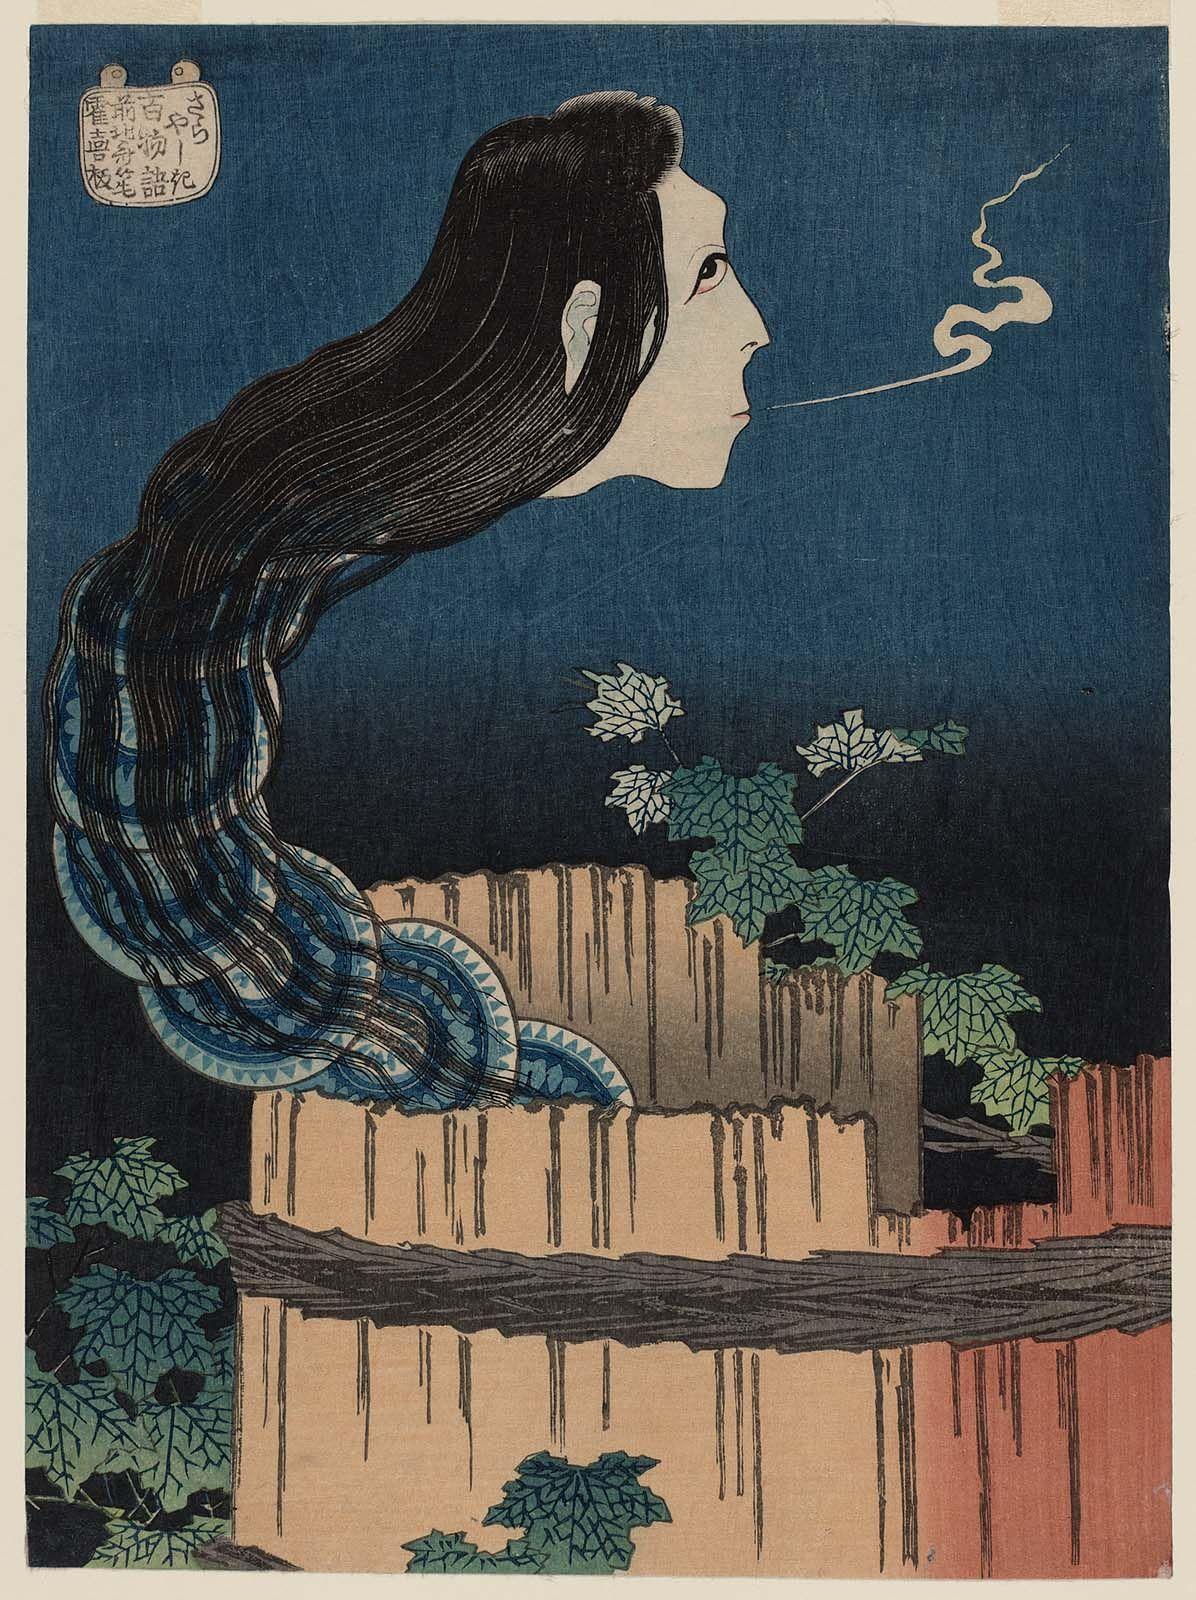 Hokusai - The Mansion of the Plates (Sara yashiki), from the series One Hundred Ghost Stories (Hyaku monogatari) | Museum of Fine Arts, Boston